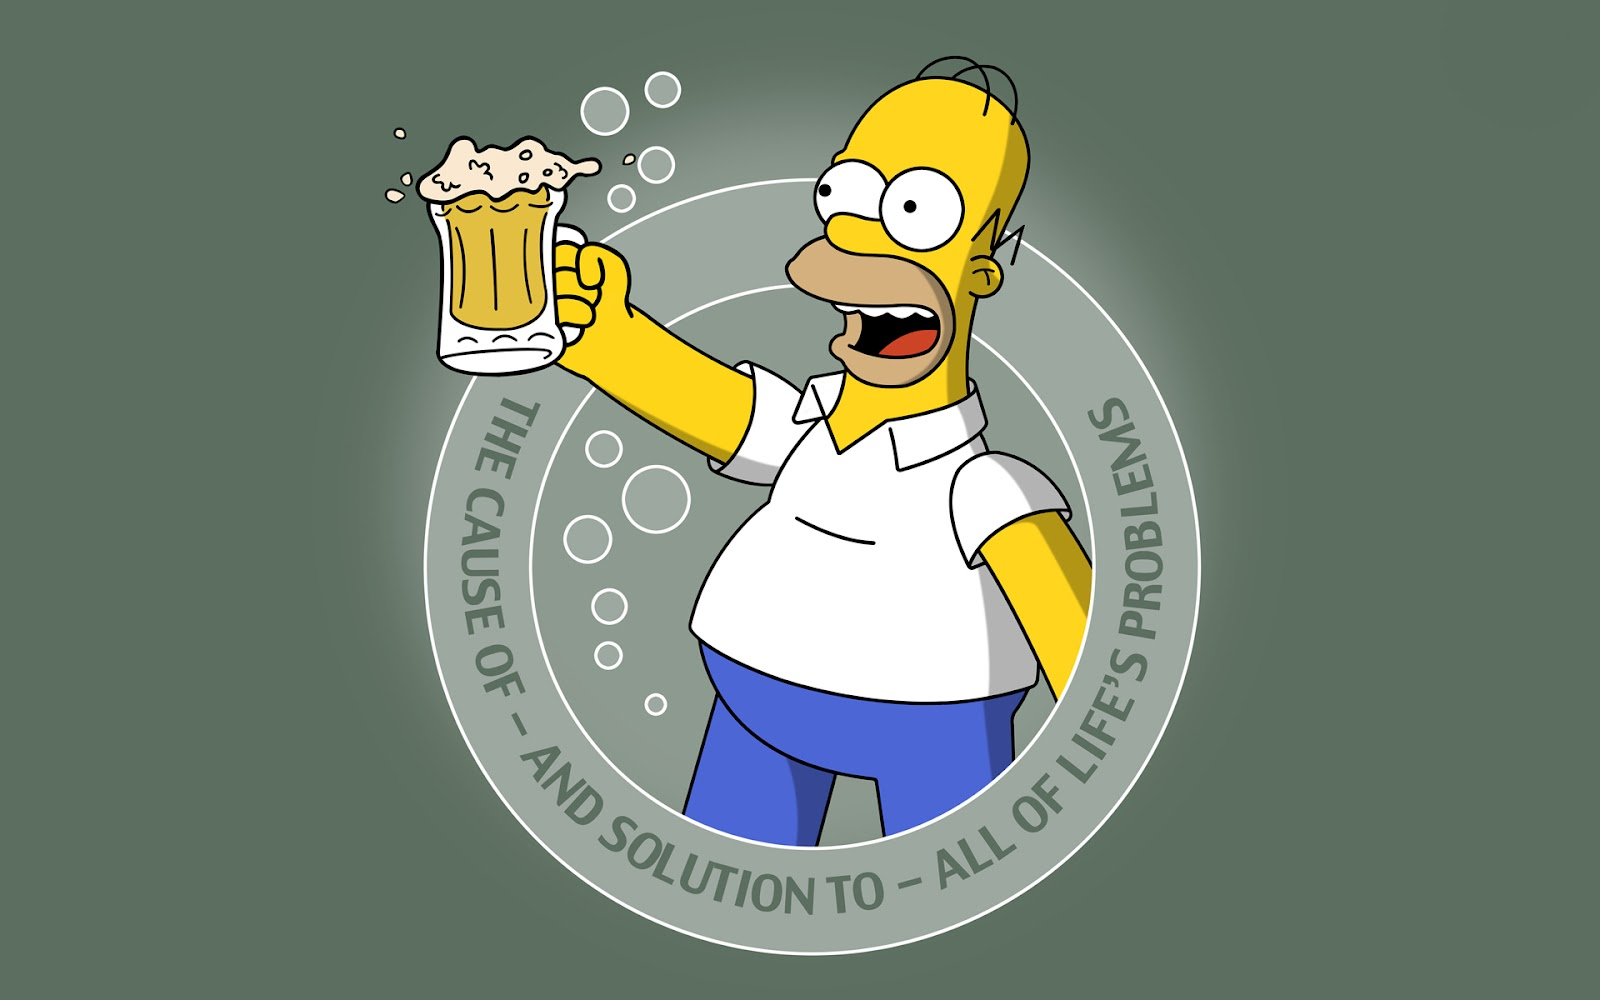 http://4.bp.blogspot.com/-DwPgtk5Ct3o/T4maZJcTqRI/AAAAAAAAZrQ/Vhk522Qc_6M/s1600/Homero-Simpson_The-Simpsons_02.jpg